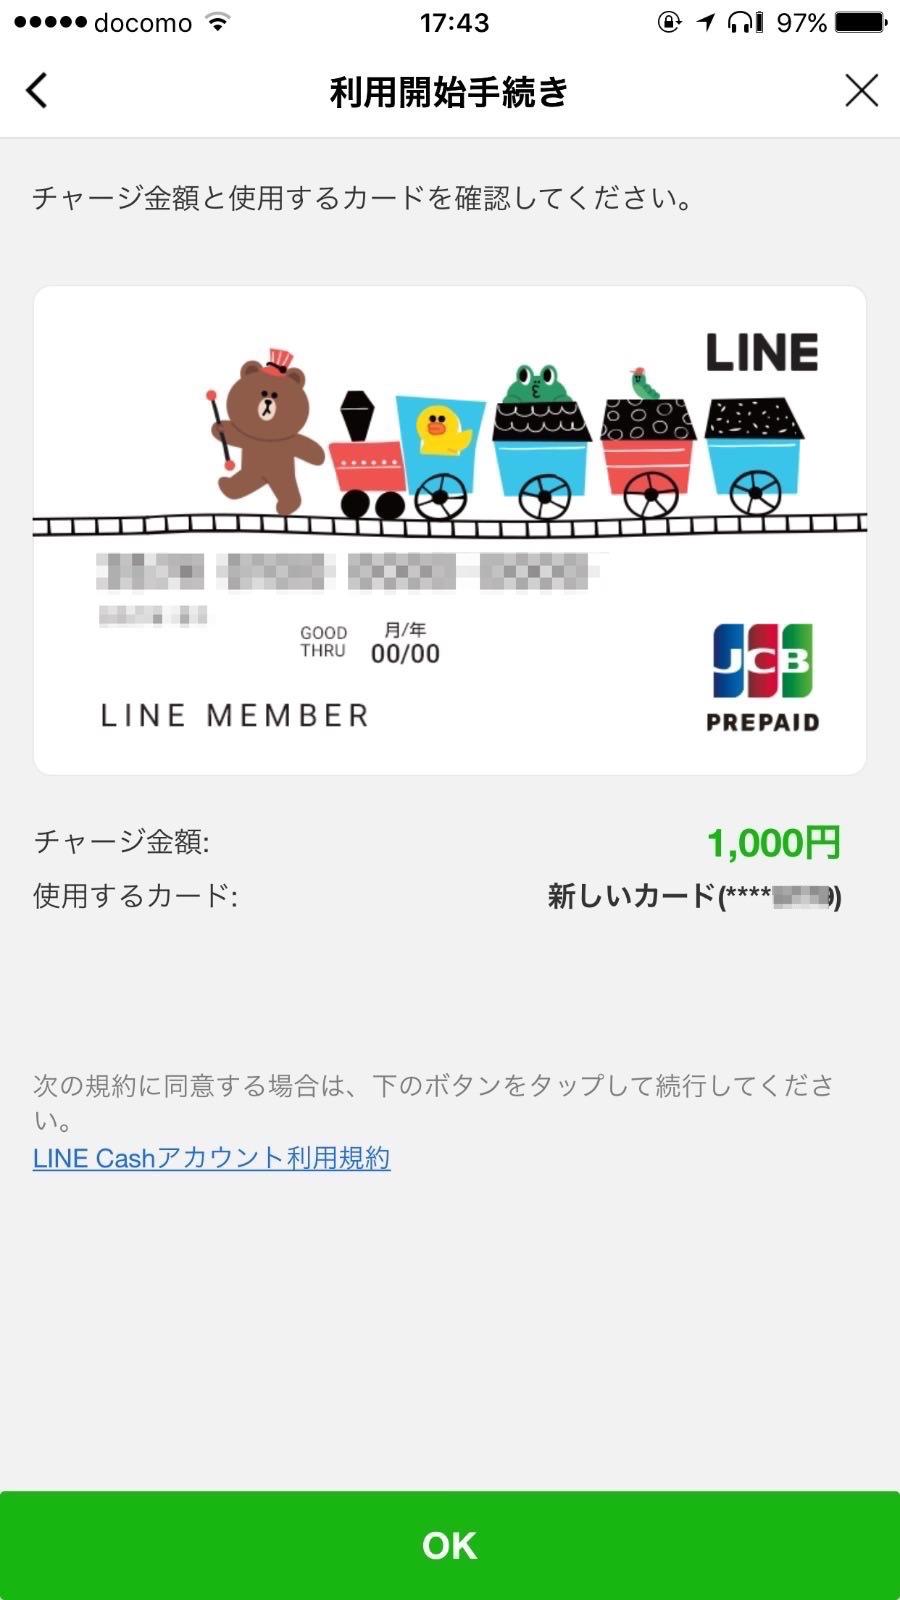 Line pay card 9345